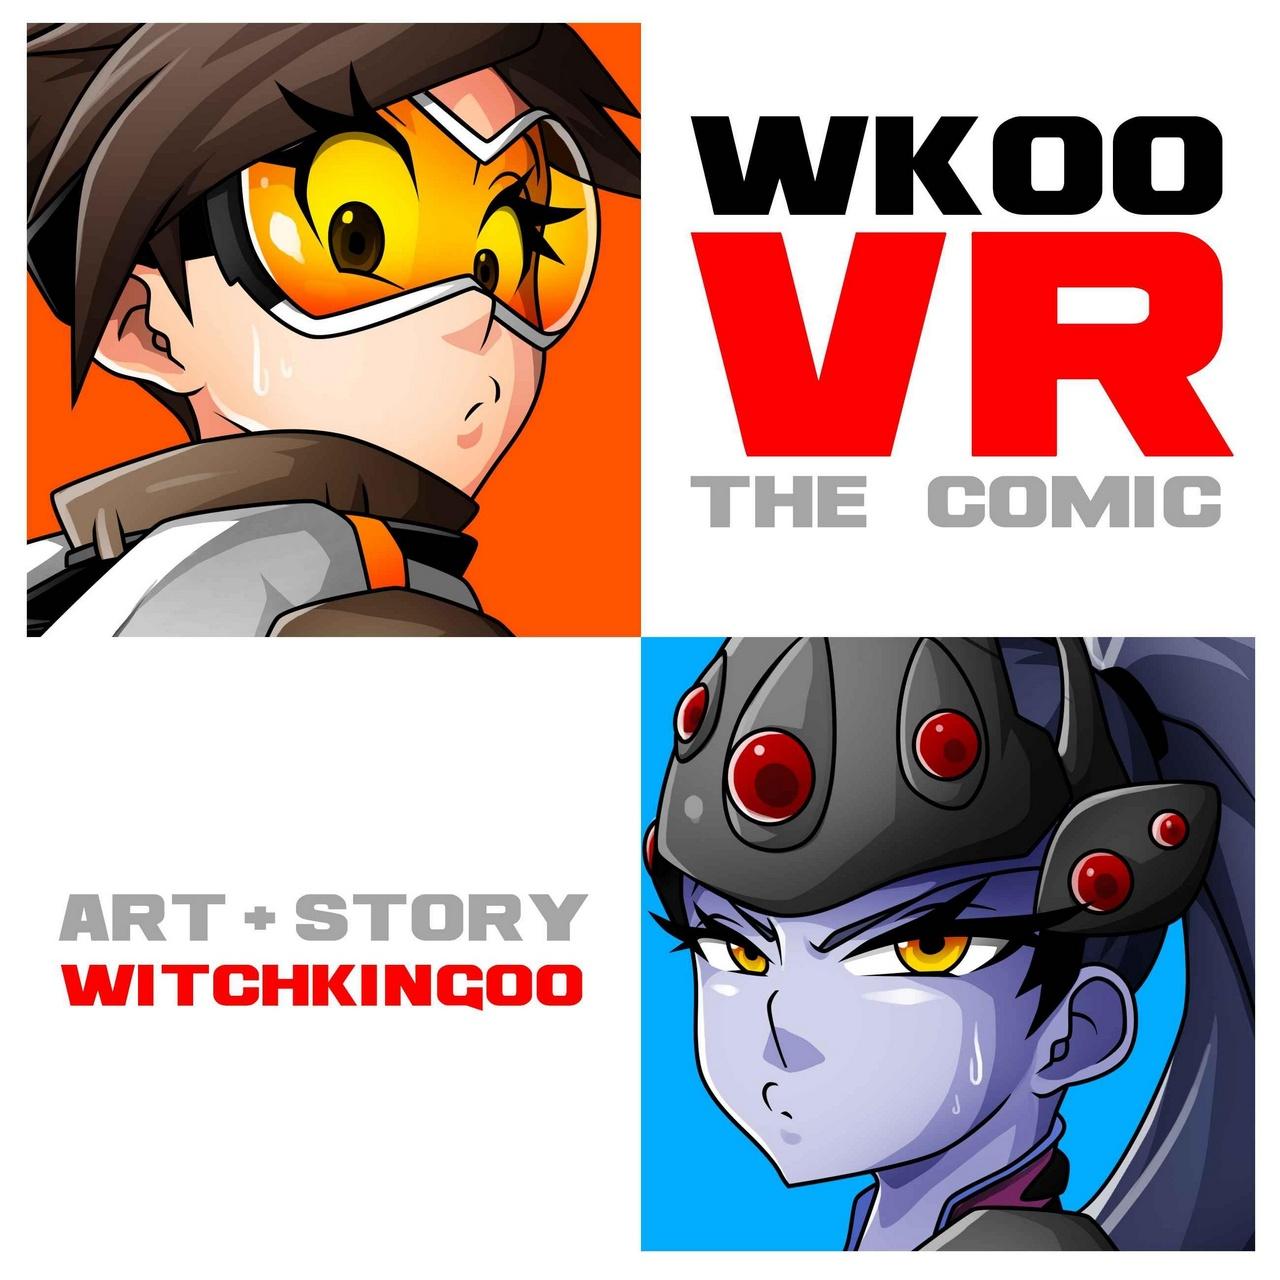 SureFap xxx porno Overwatch - [Witchking00] - VR the Comic